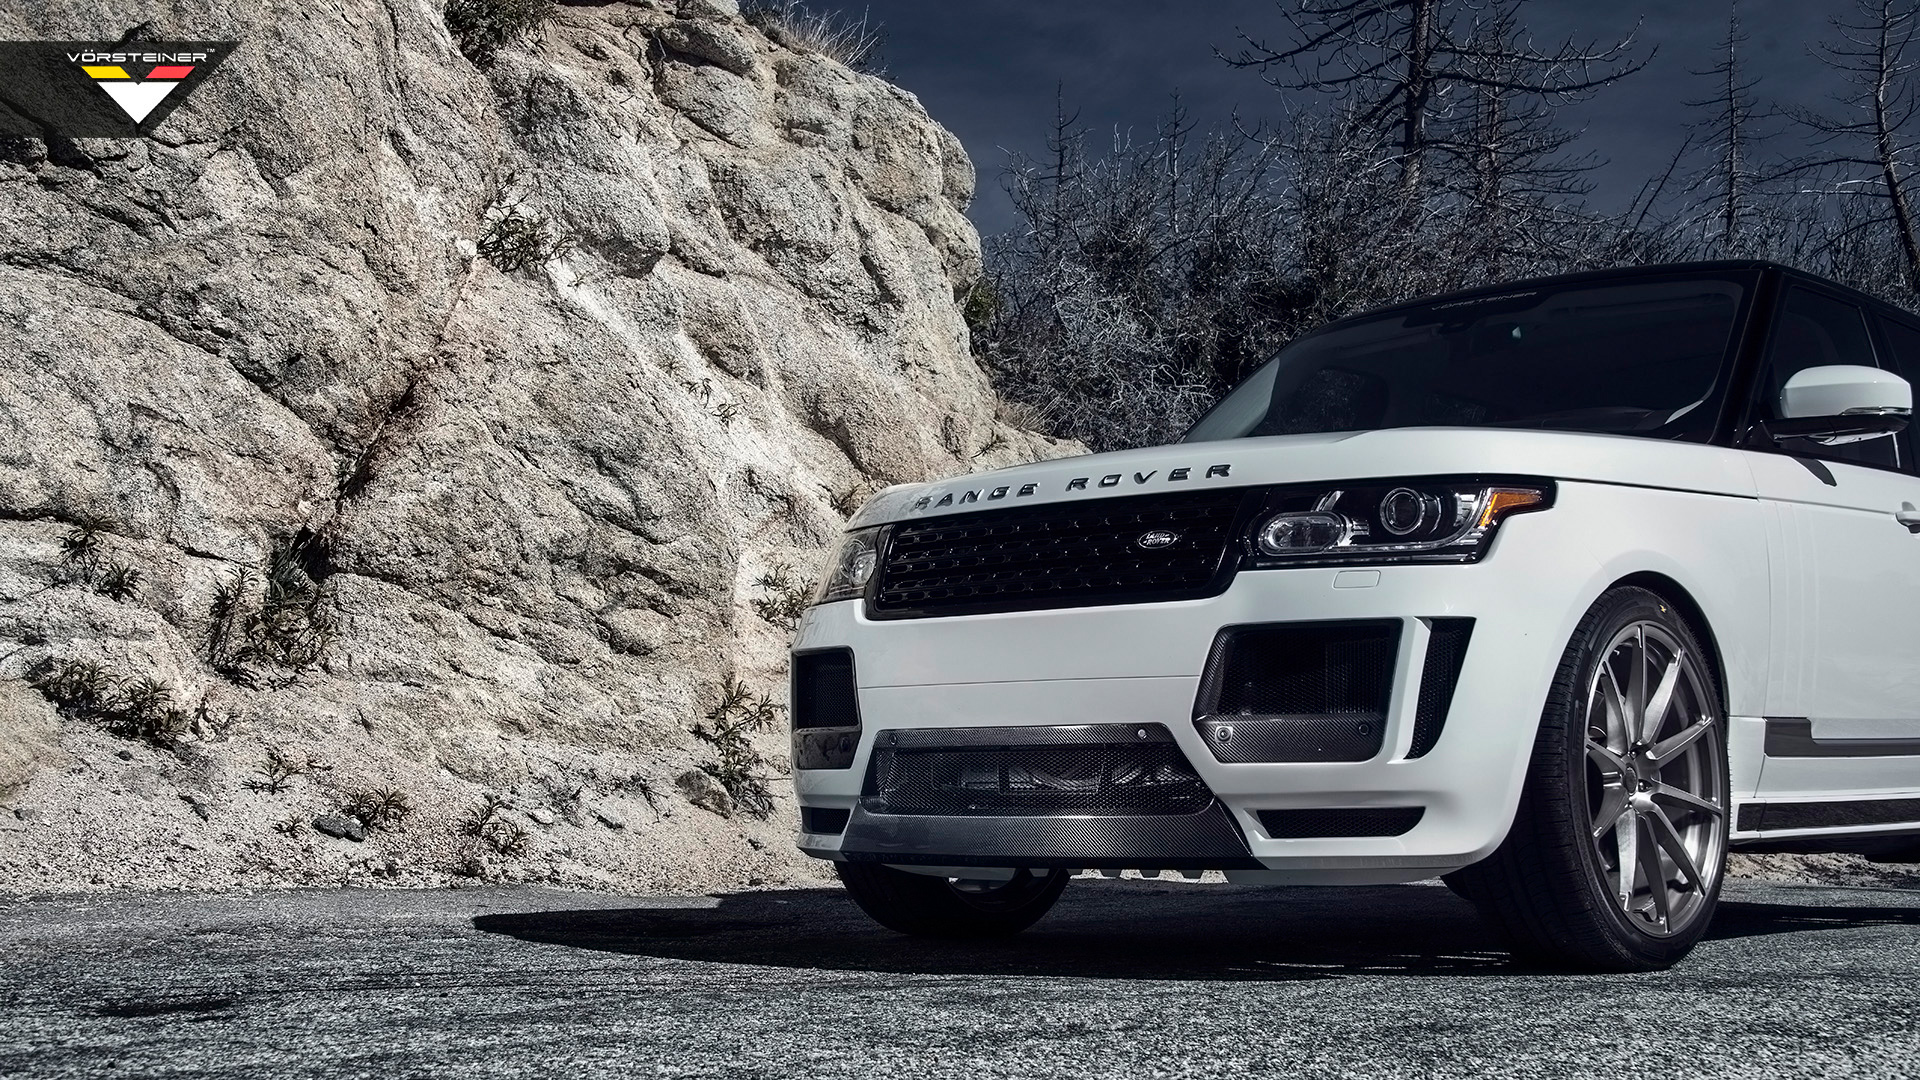 Download 2014 Vorsteiner Range Rover Veritas Wallpaper Hd Car